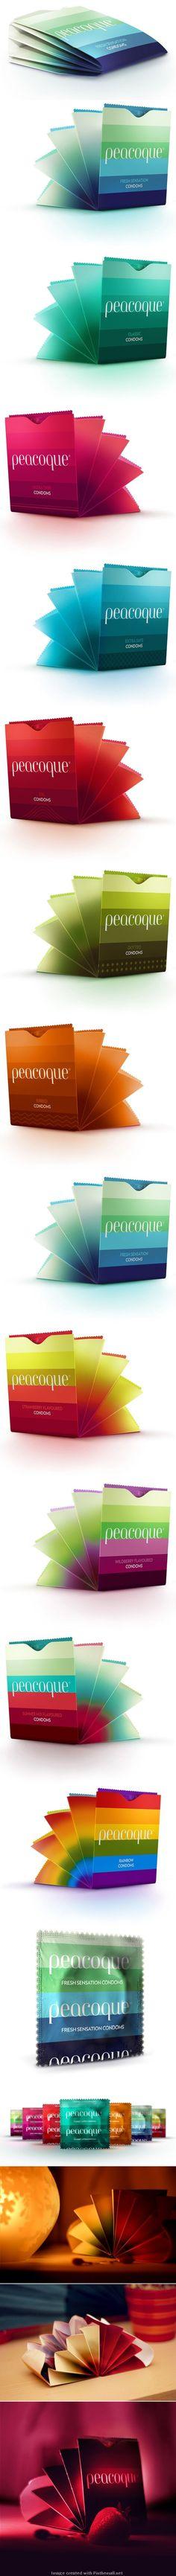 Peacoque - Innovative Condom Packaging by Petar Pavlov. Yes, it's true #2013…